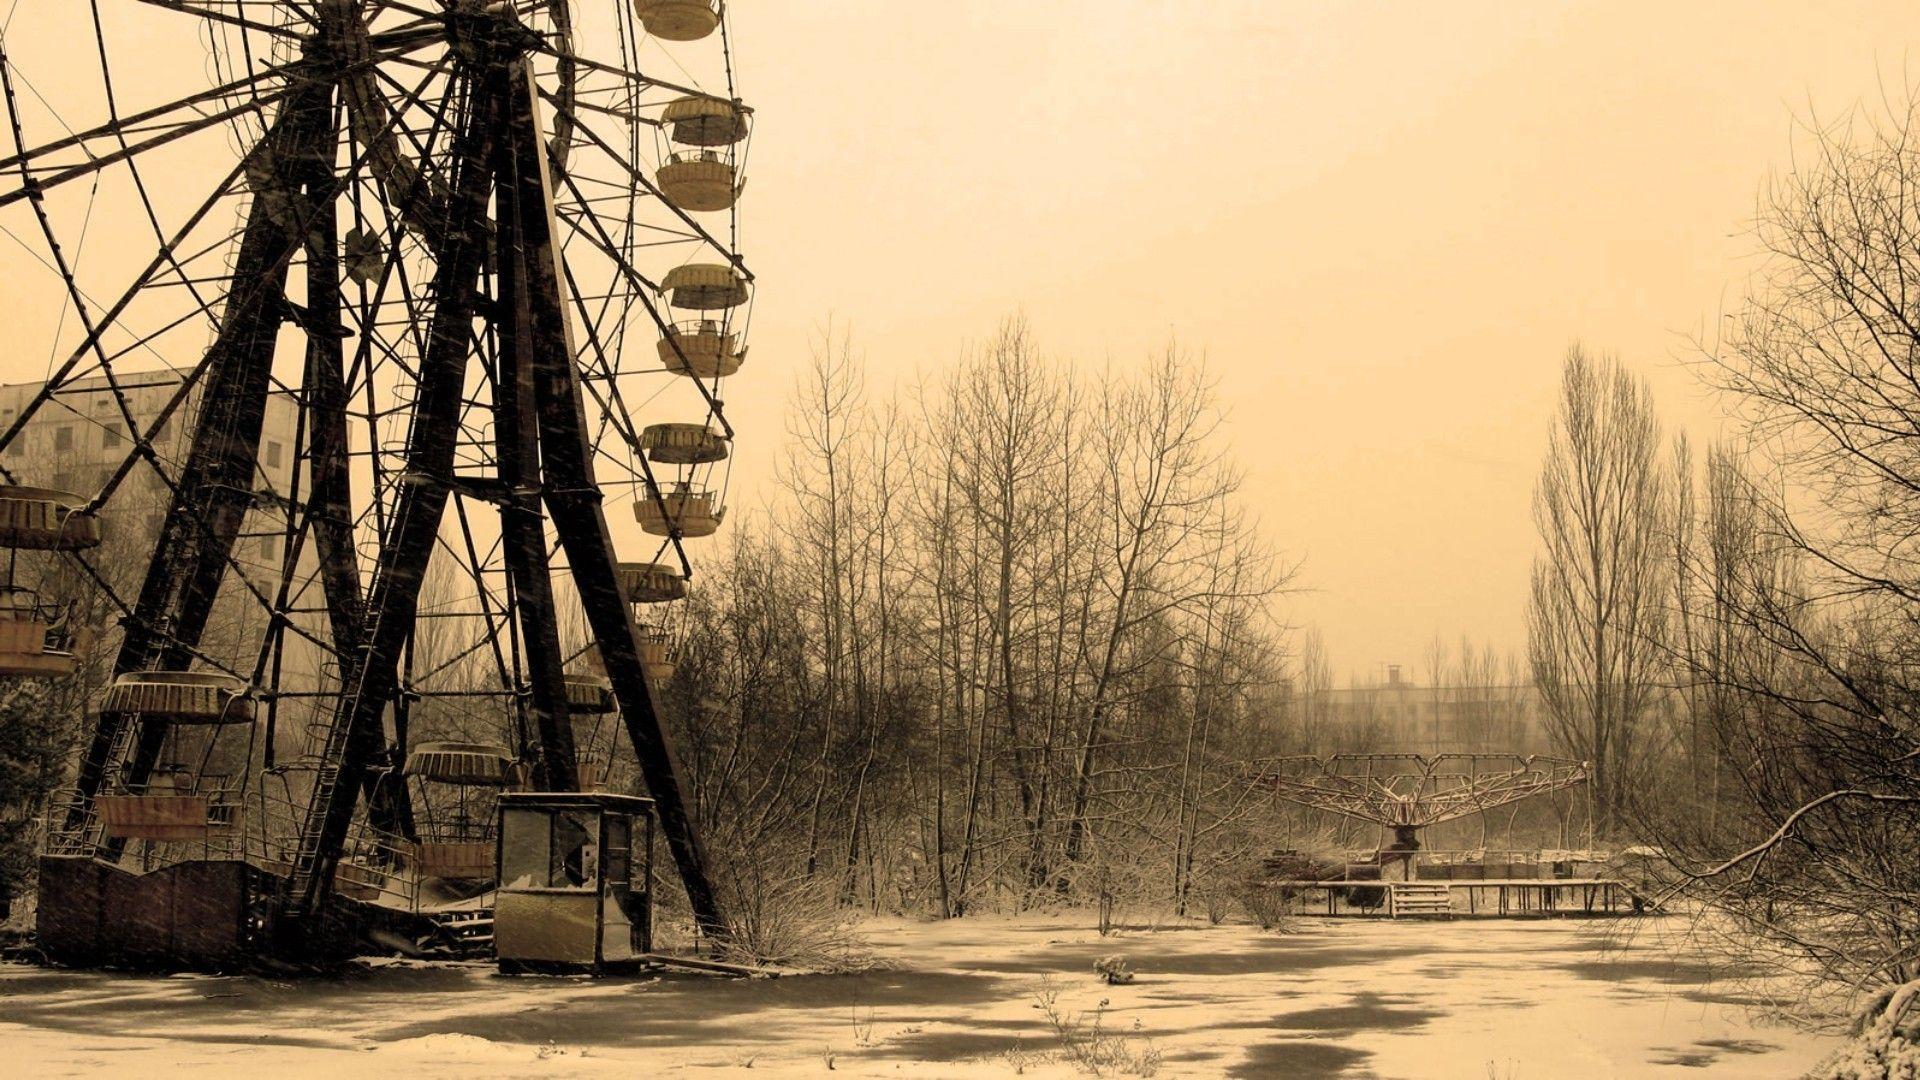 Pripyat Amusement Park - Ferris Wheel - modlar com